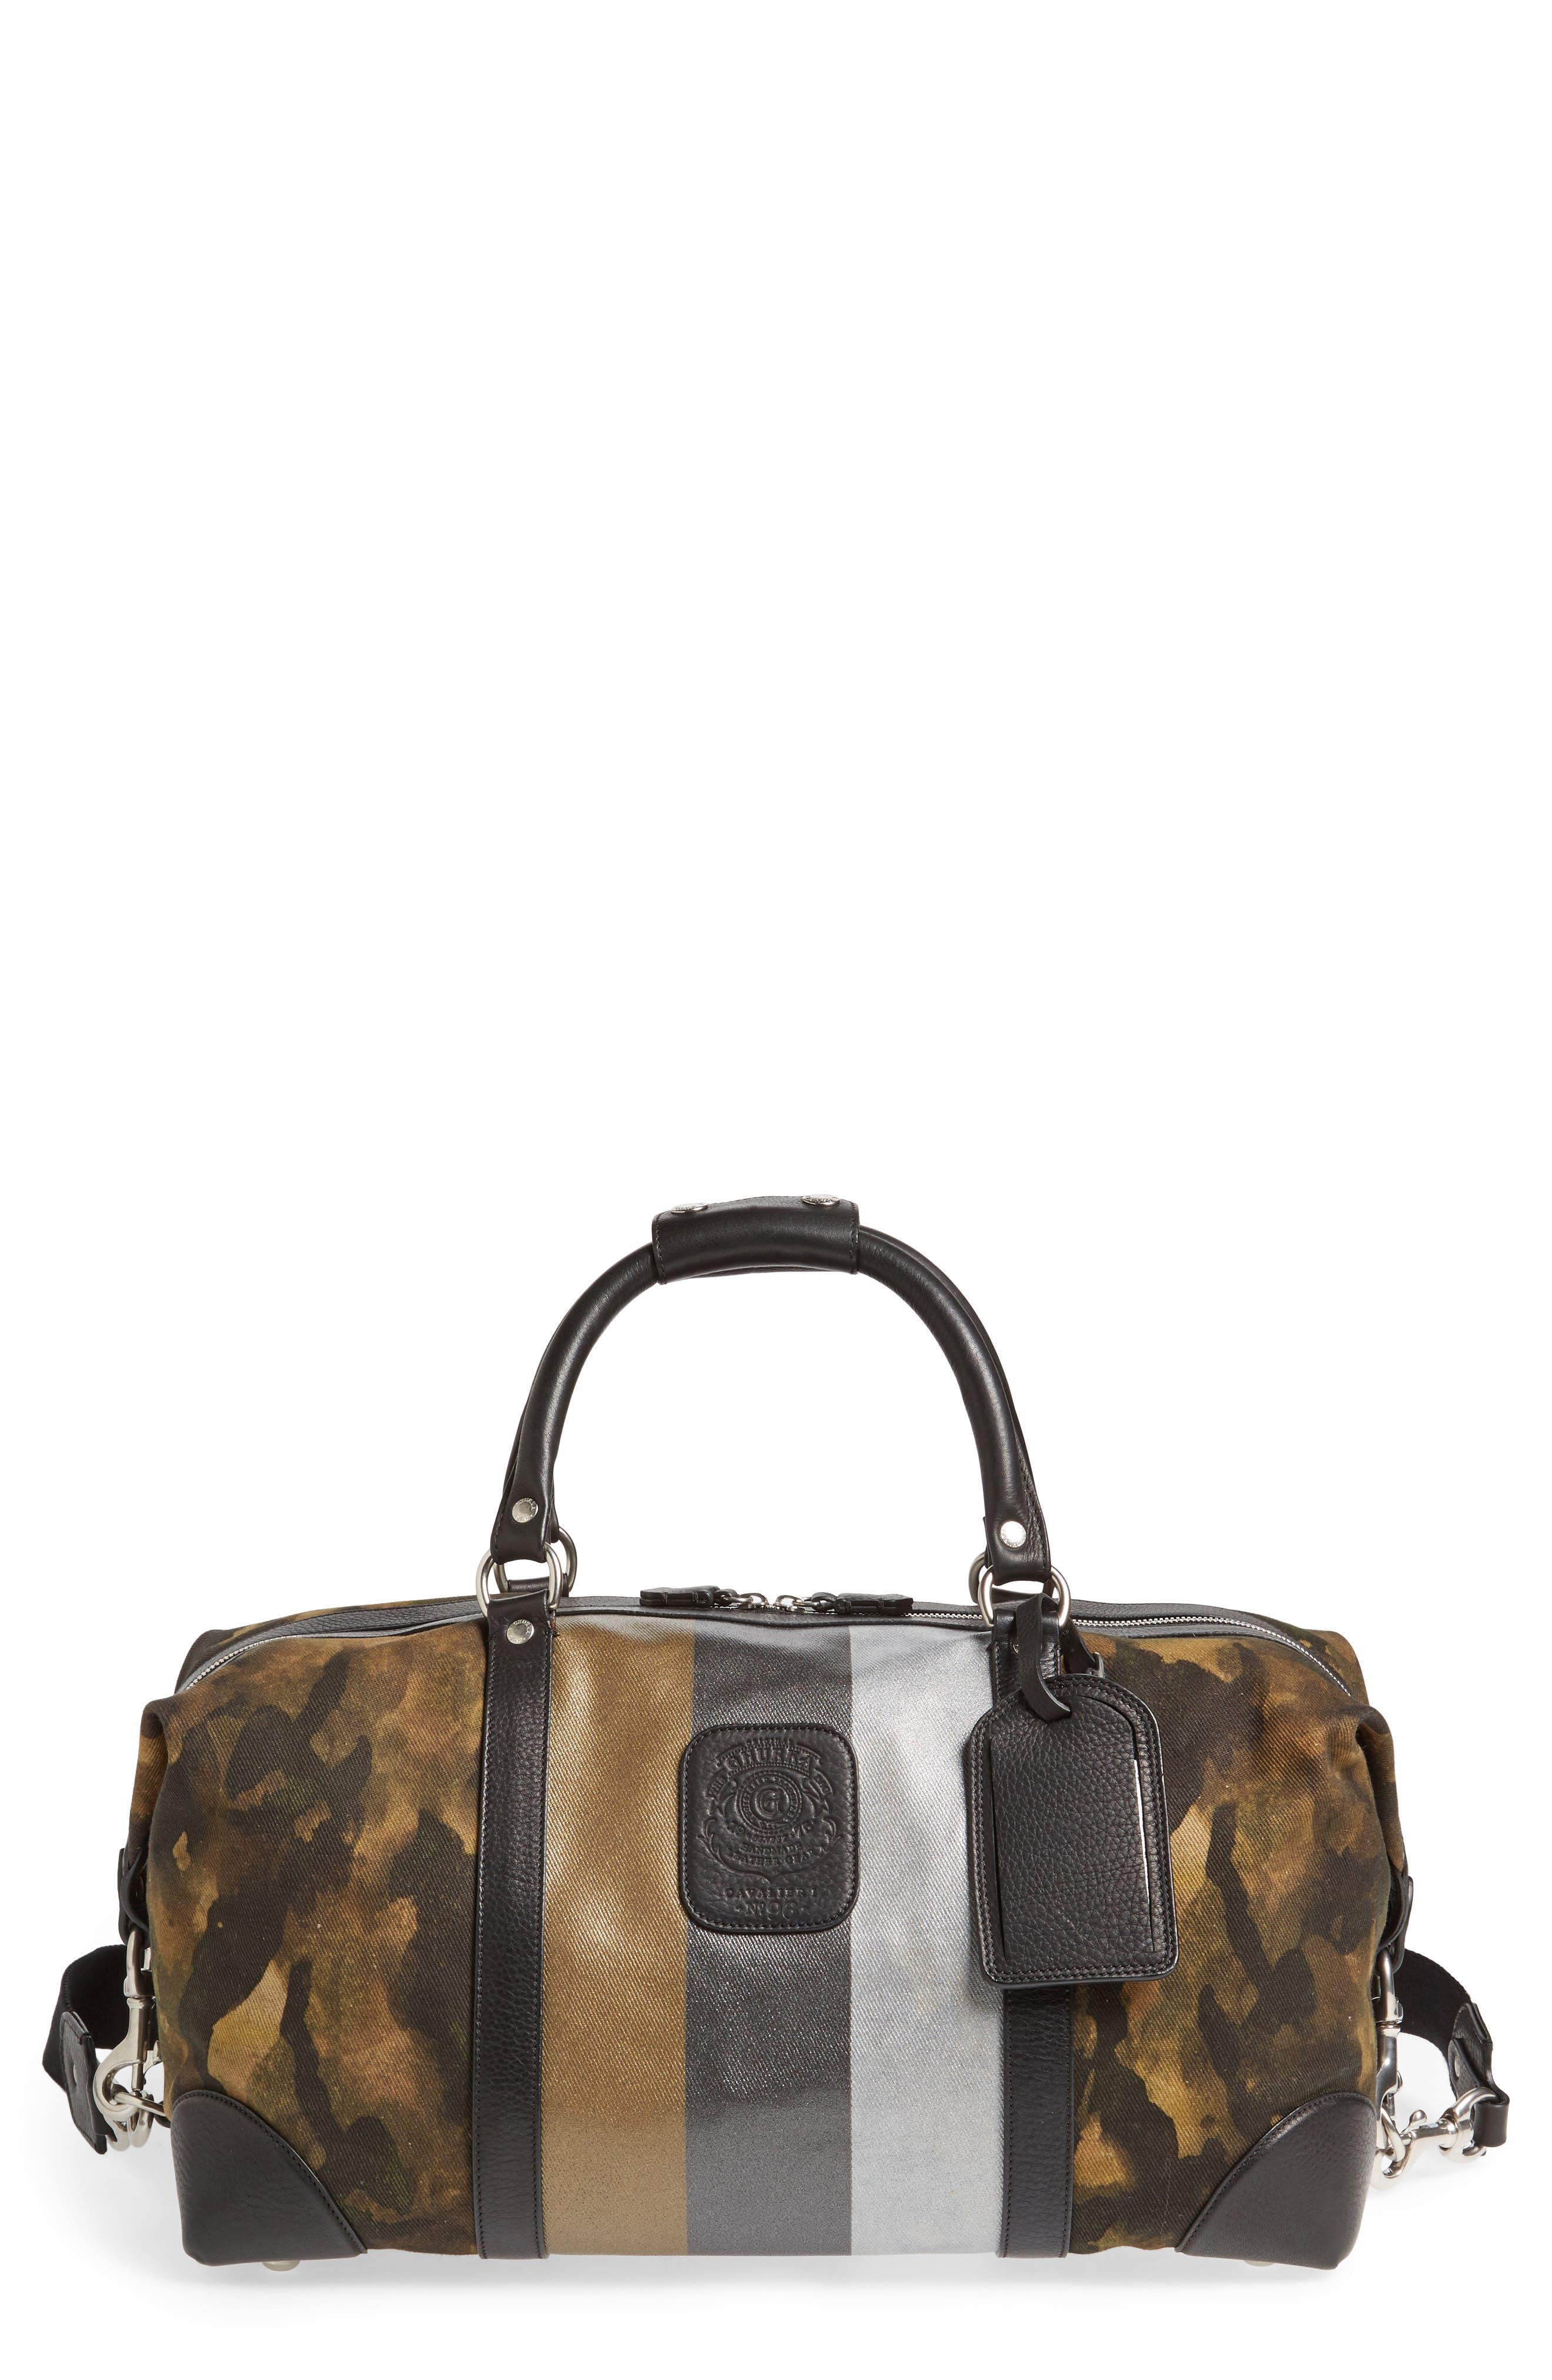 Ghurks Cavalier I Duffel Bag